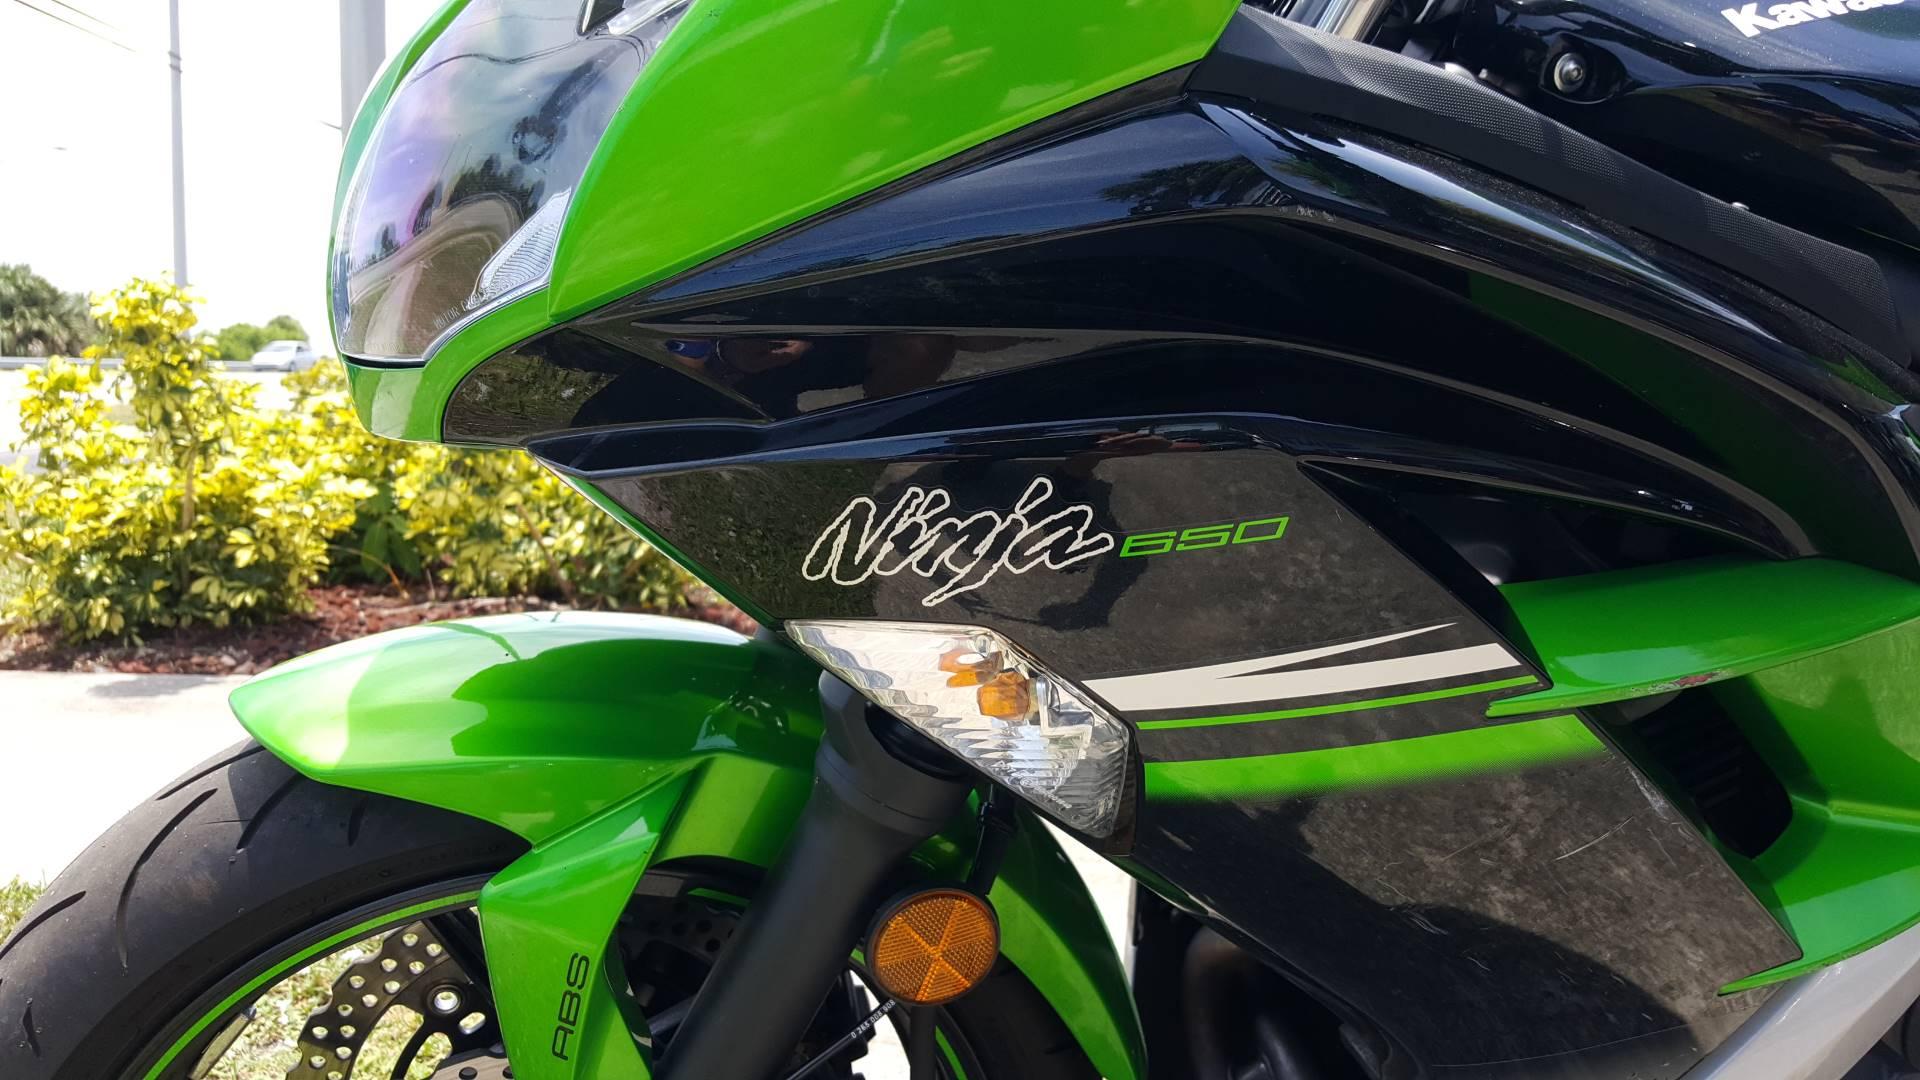 2016 Kawasaki Ninja 650 5